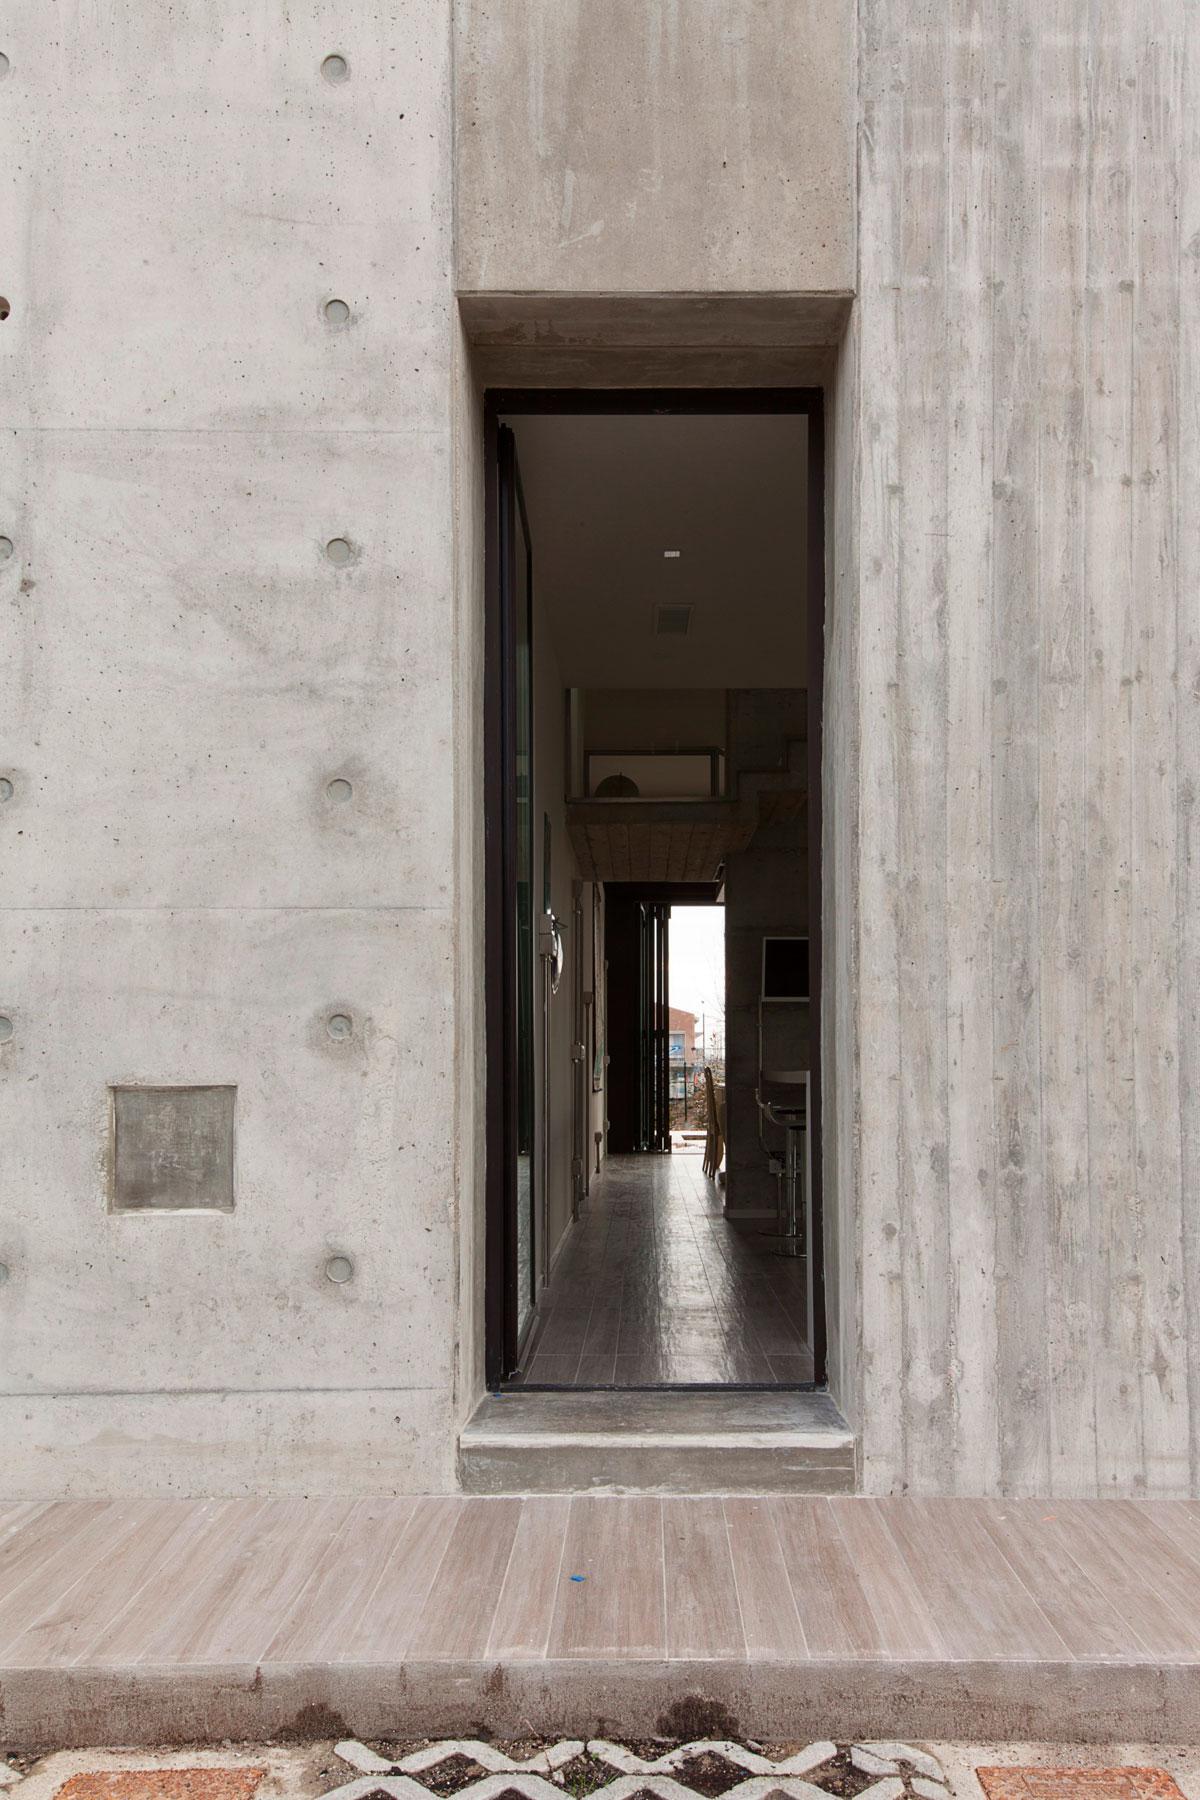 D'Autore Residence near Bologna by Giraldi Associati Architetti-13